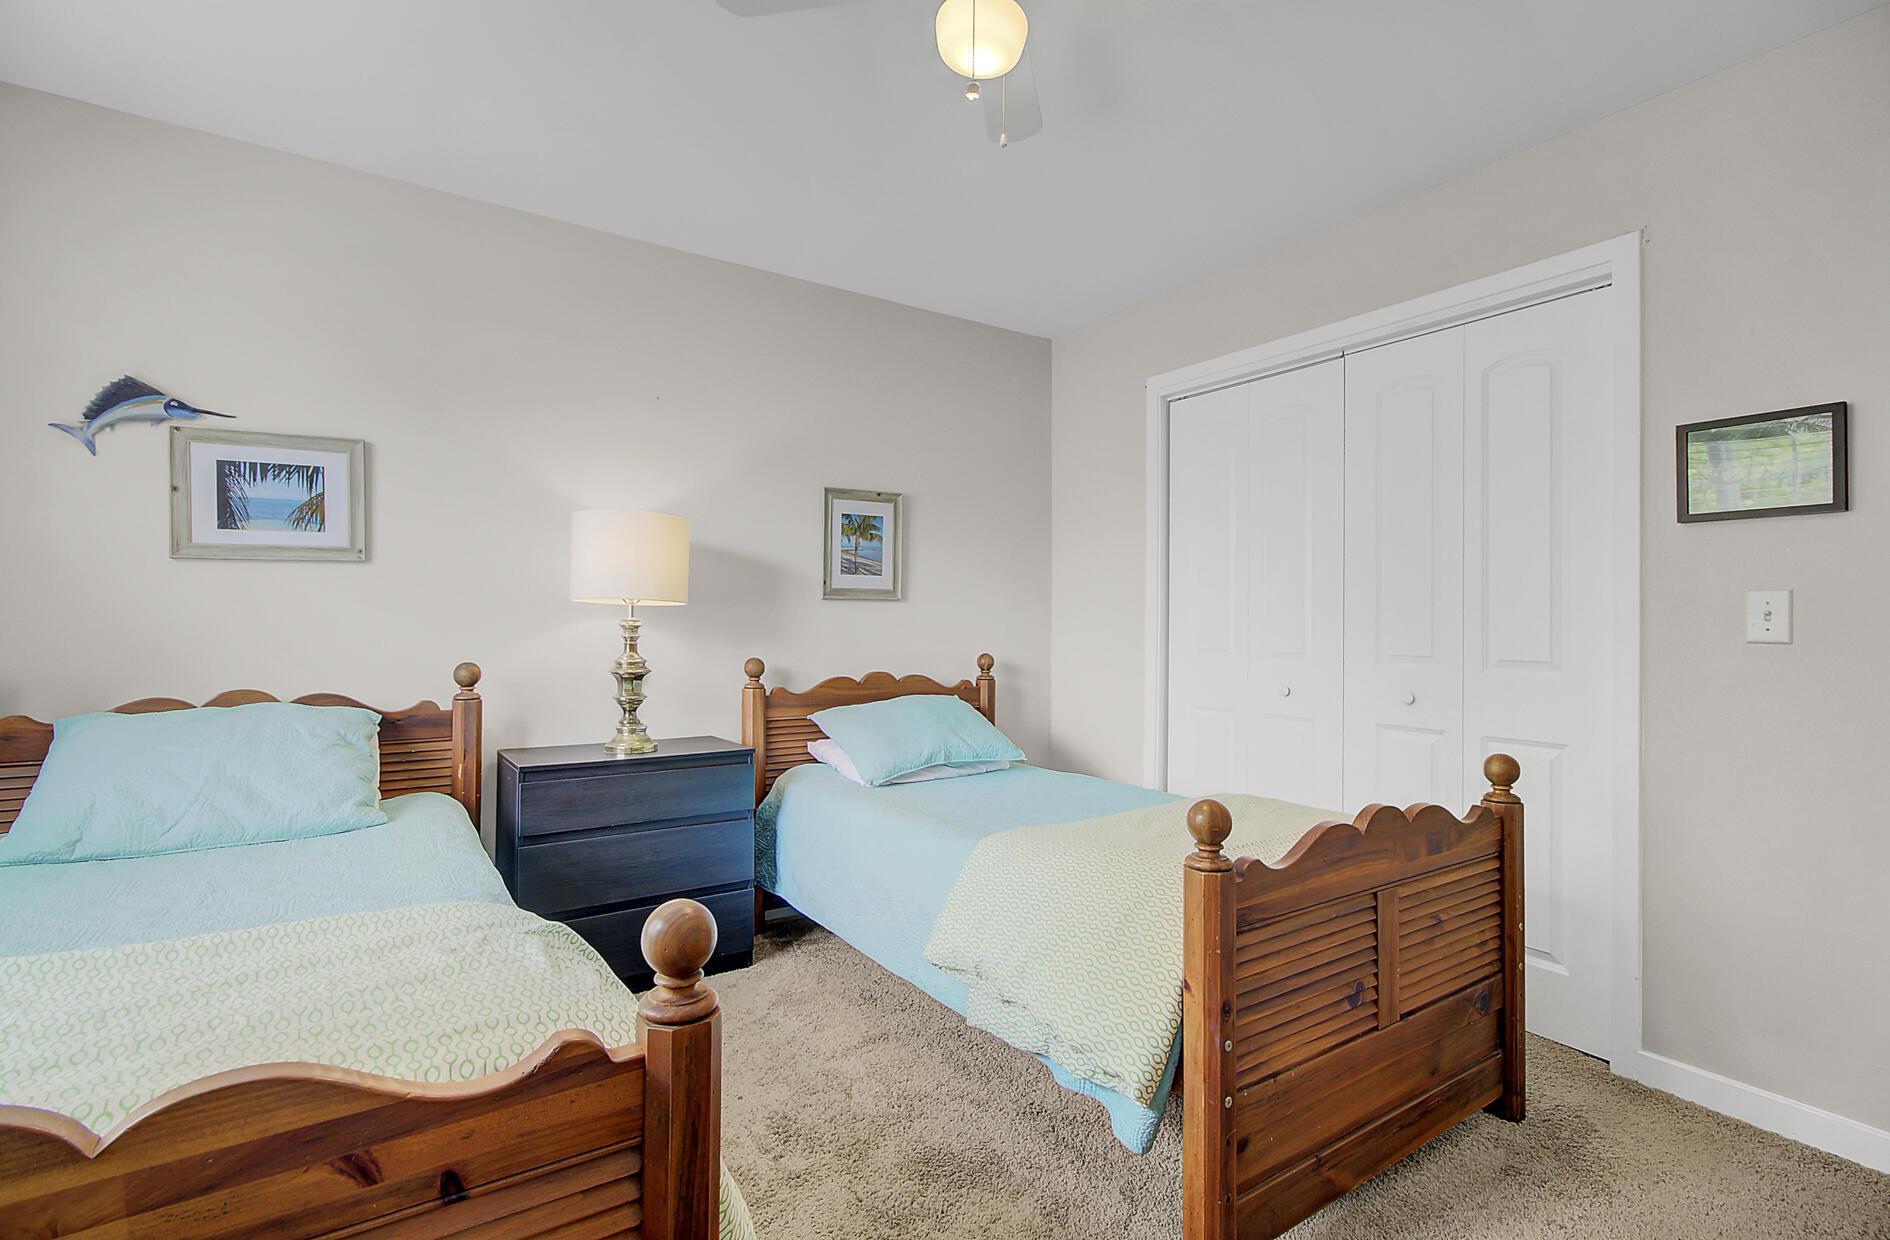 Riverland Place Homes For Sale - 234 Stefan, Charleston, SC - 2